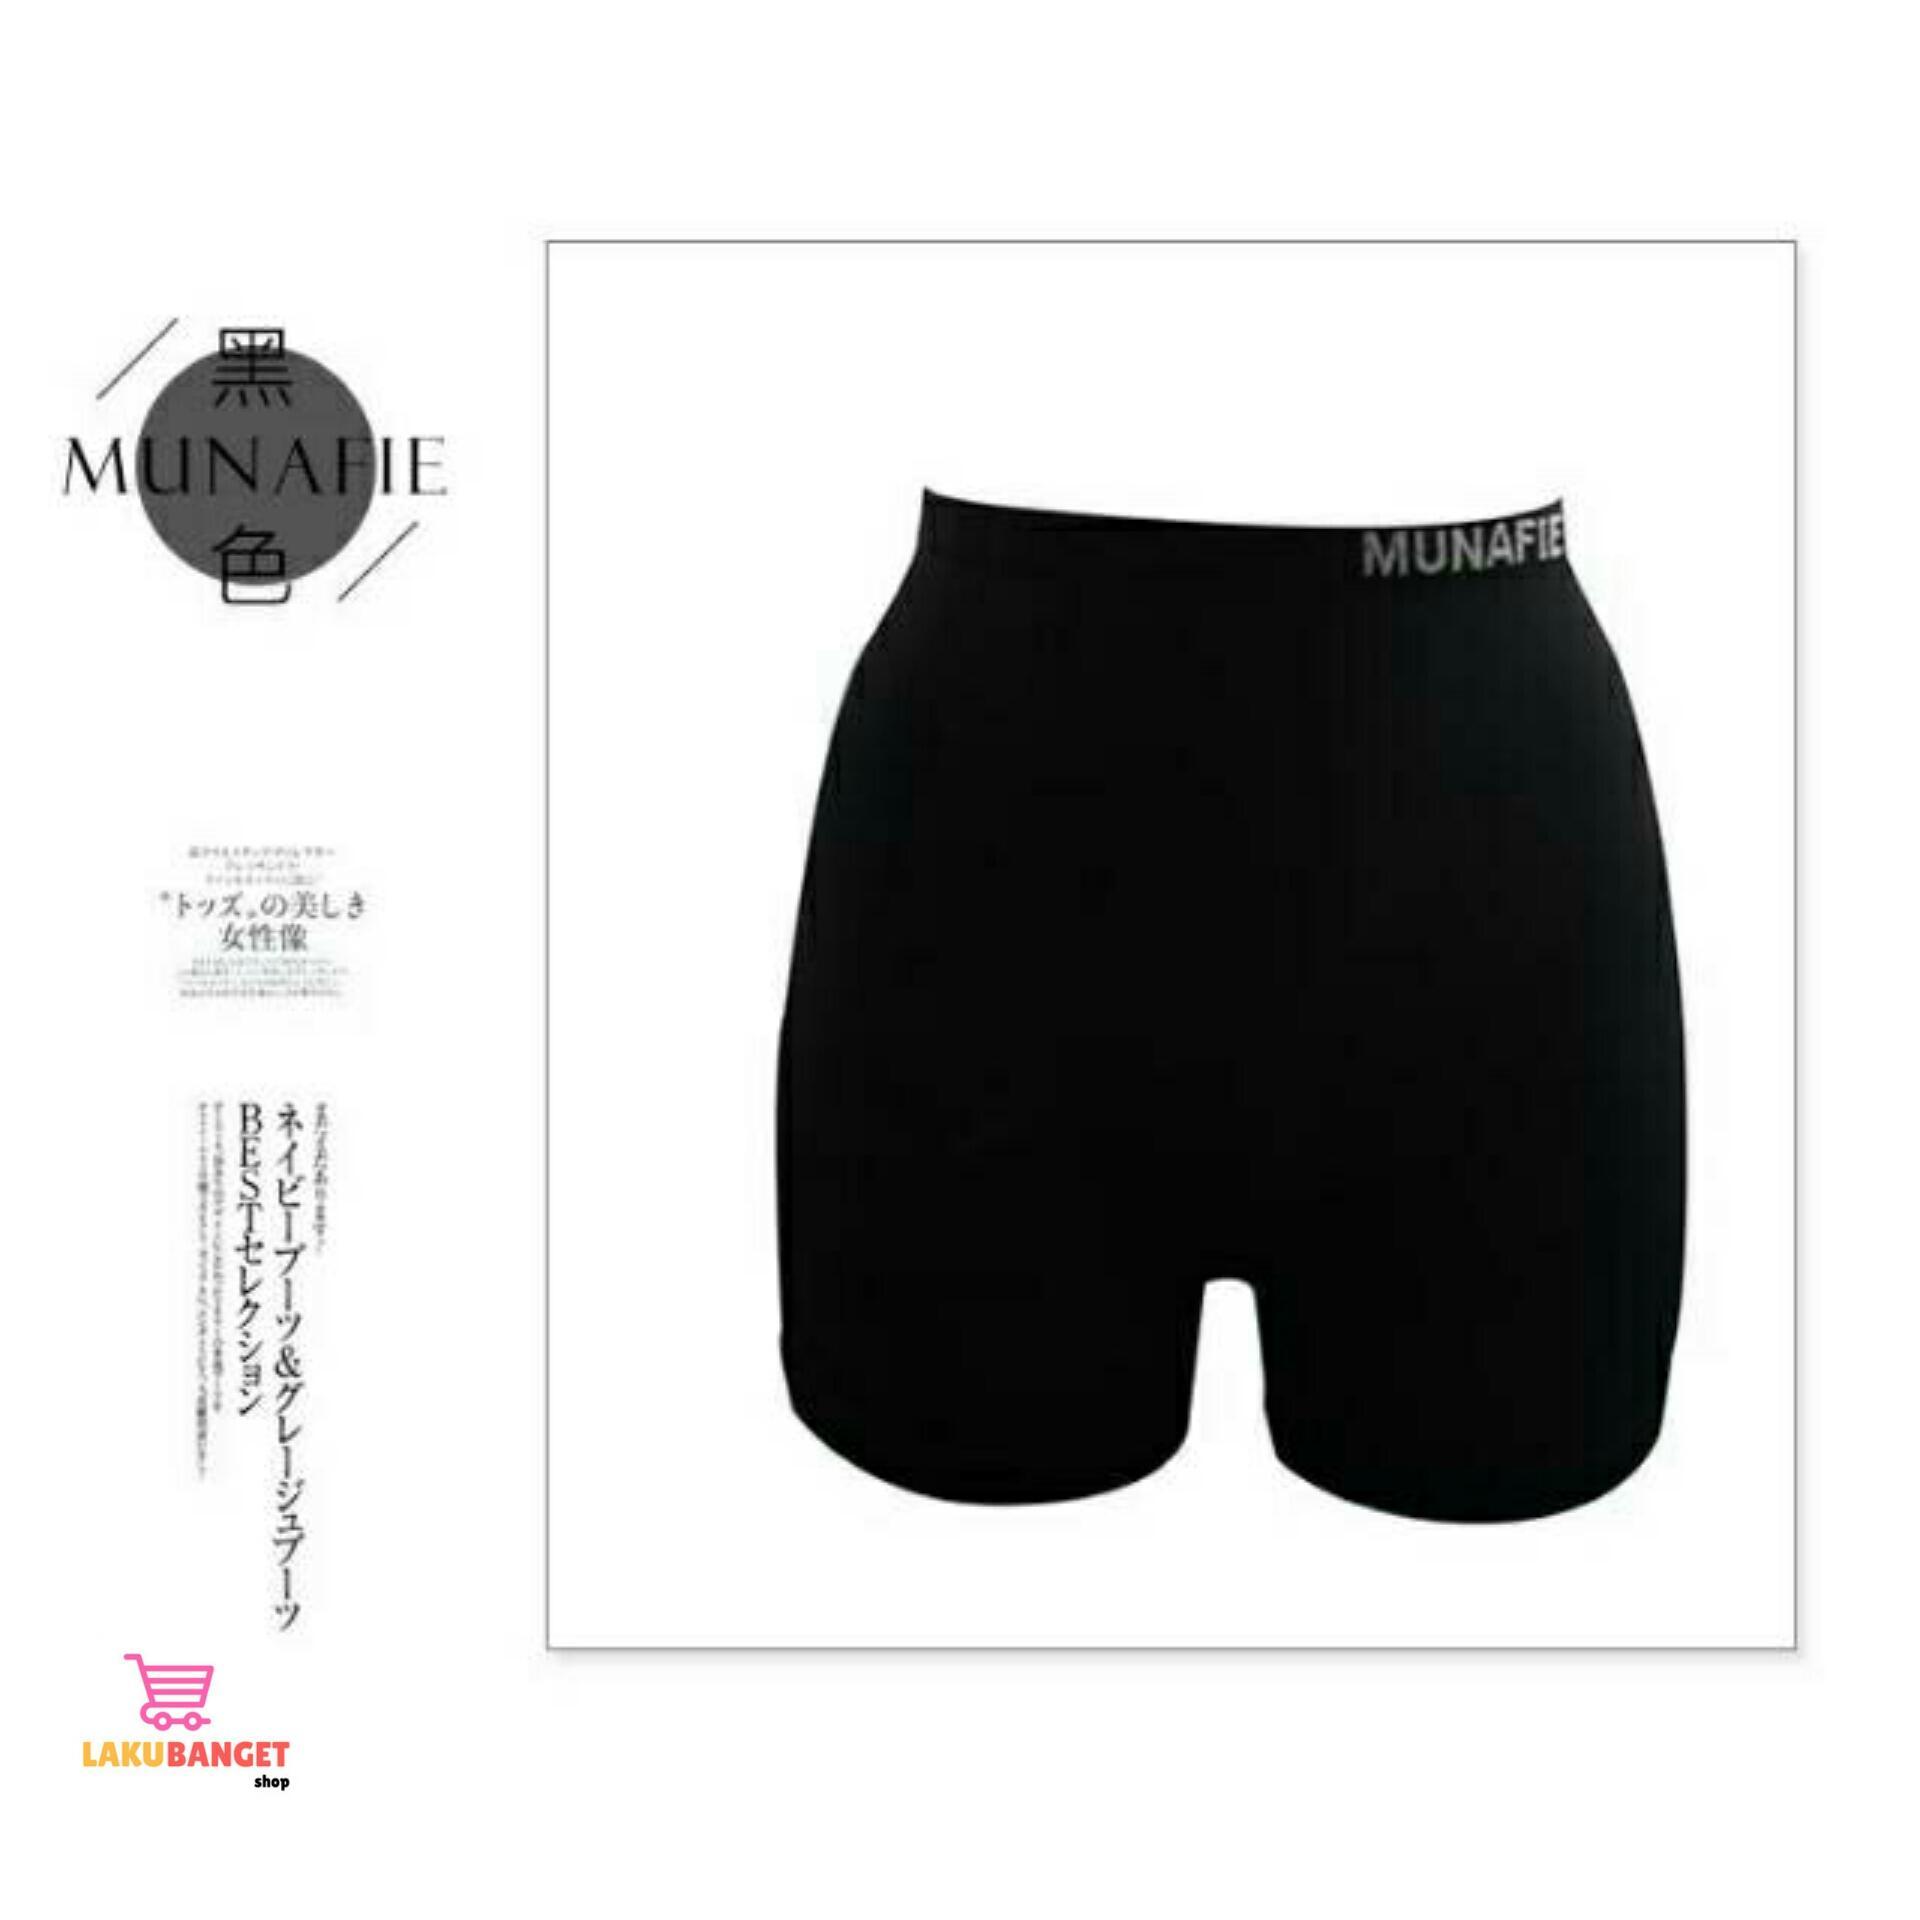 Review Lakubanget Munafie Korset Celana Slimming Body Shape Premium Munafie Di Jawa Timur